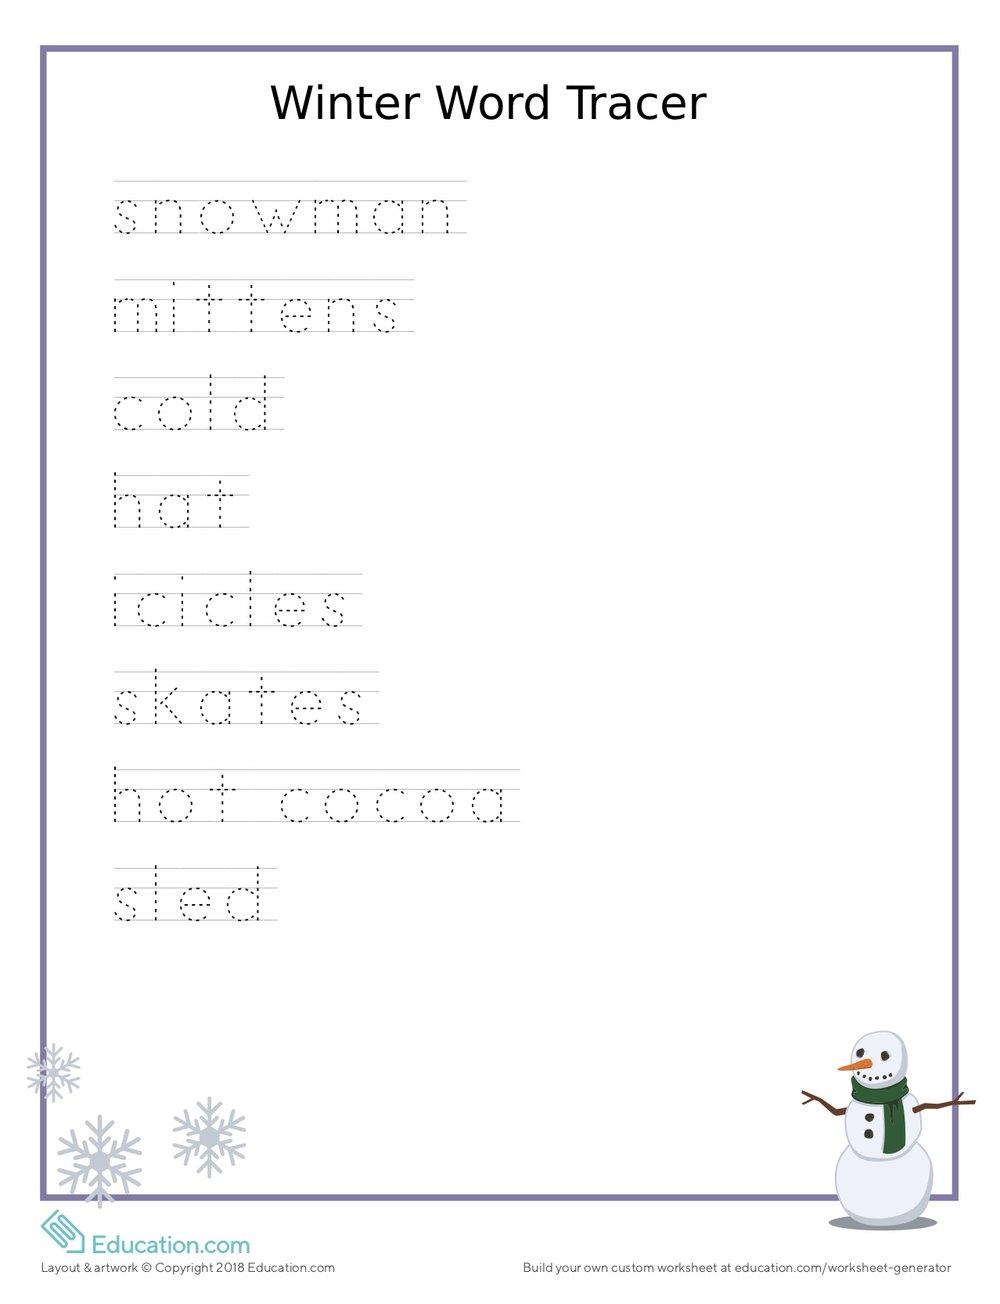 word_tracer_snowman.jpg